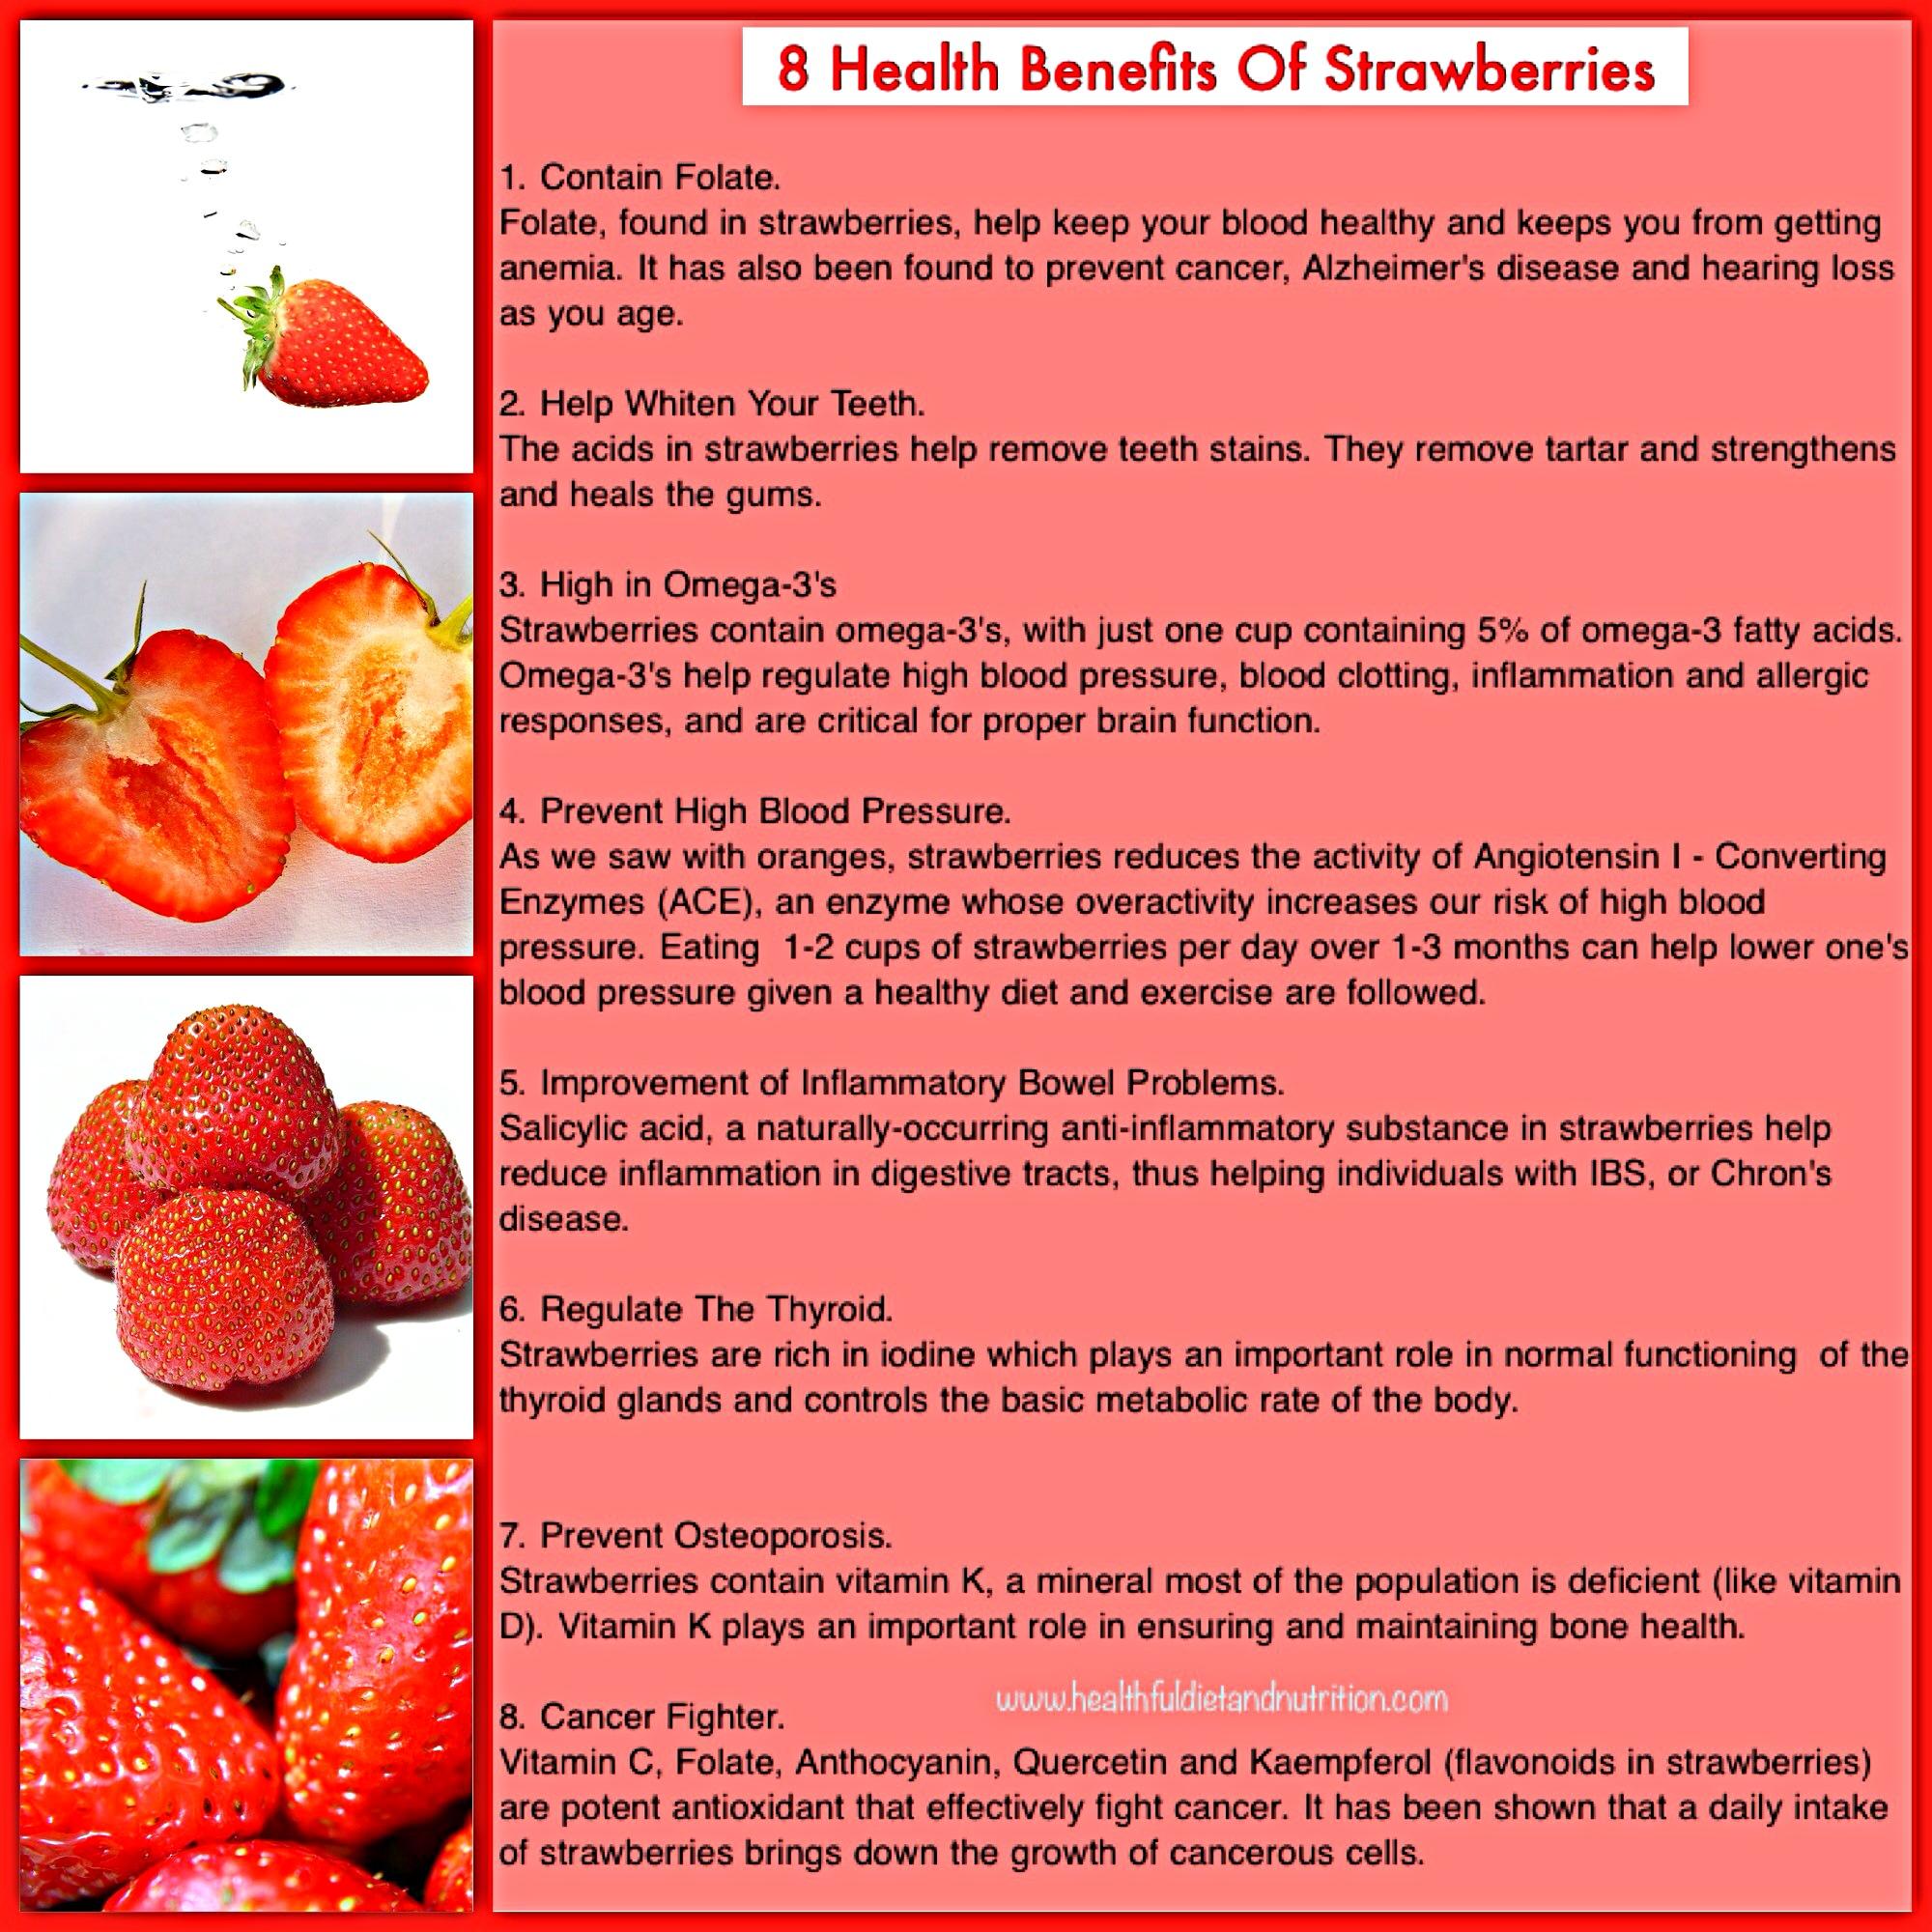 8 Health Benefits of Strawberry Fruit